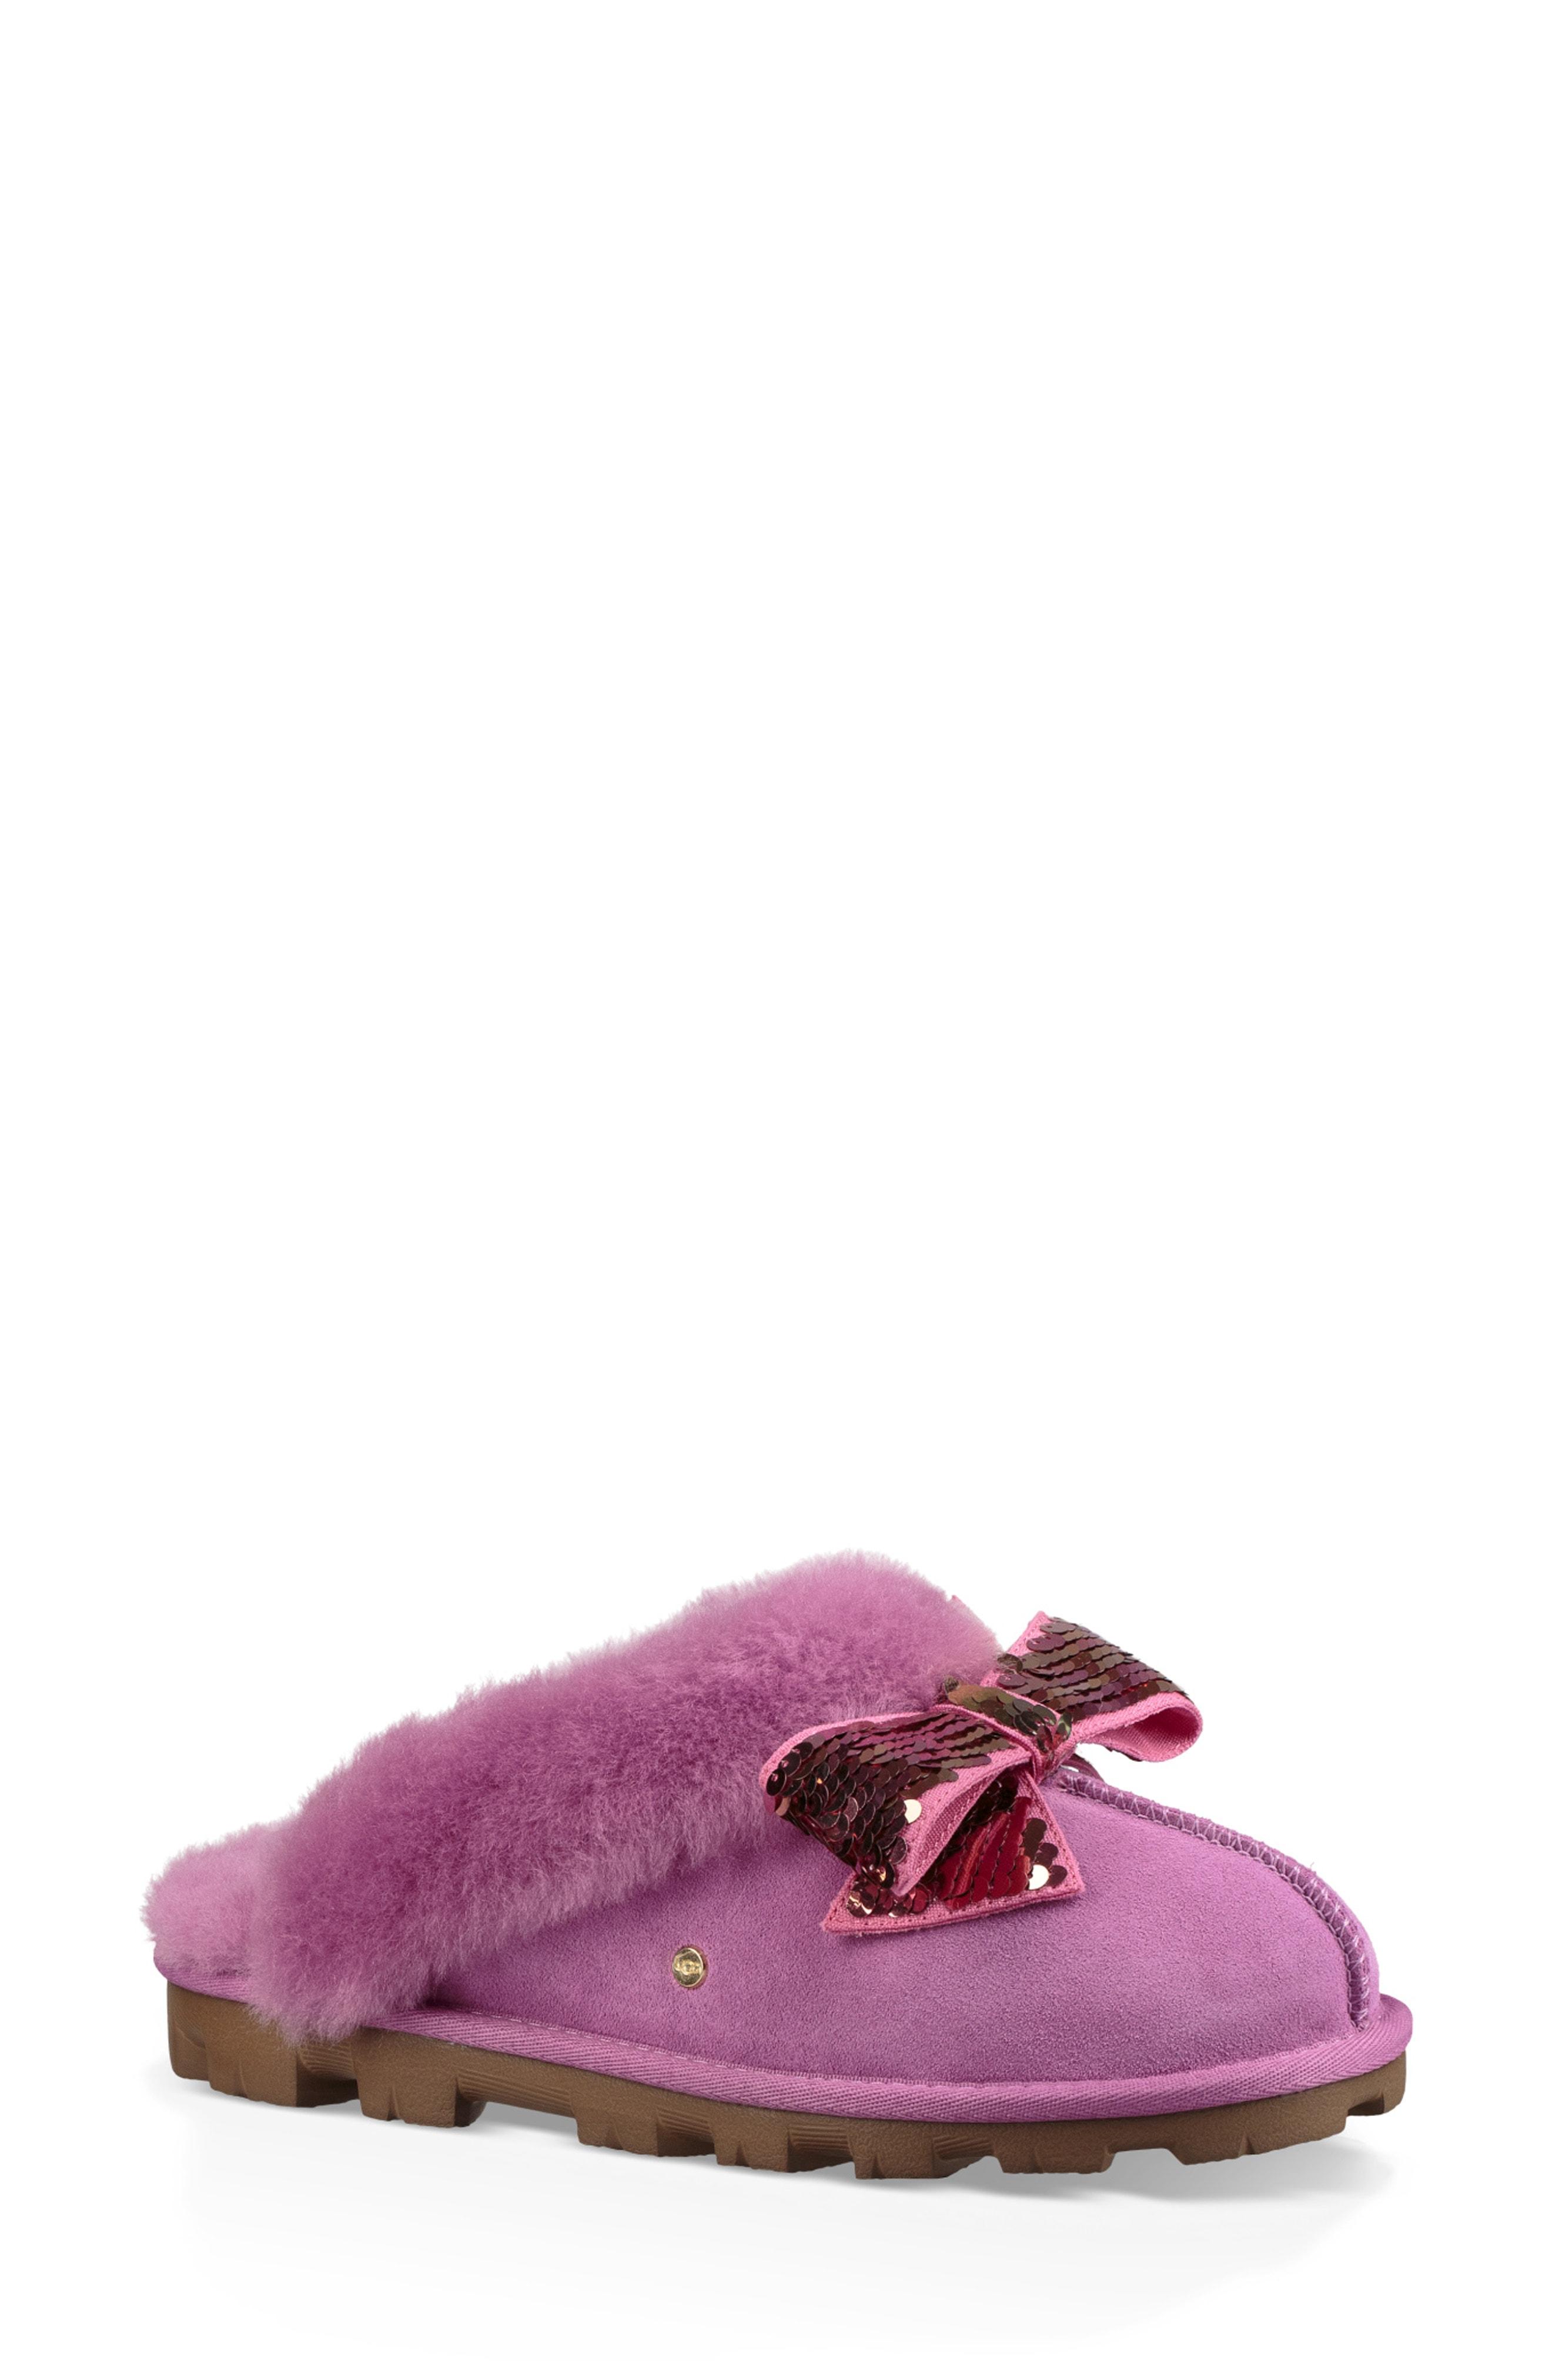 UGG Genuine Shearling & Sequin Bow Slipper (Women)